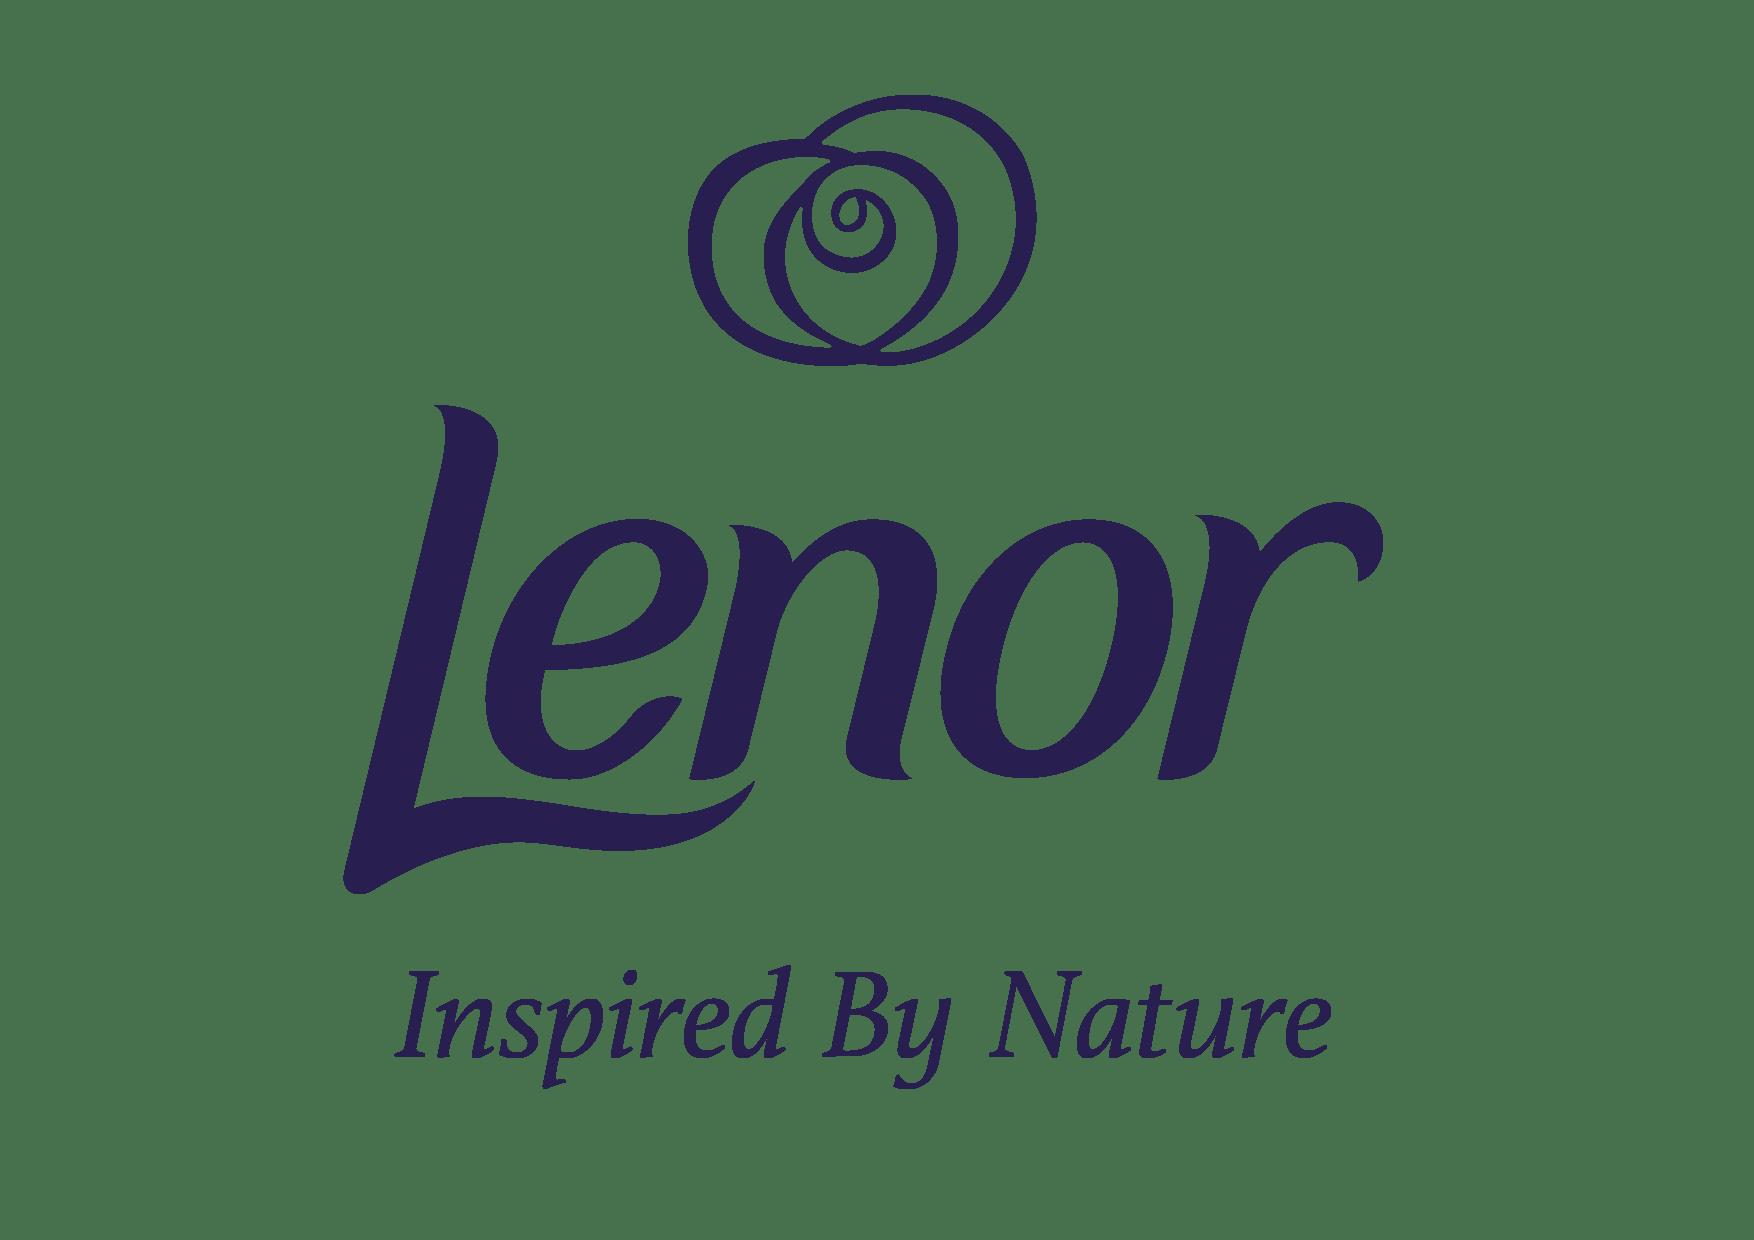 DIY Jeu Du Morpion En Tissu (Idée Cadeau!) avec #Lenor.